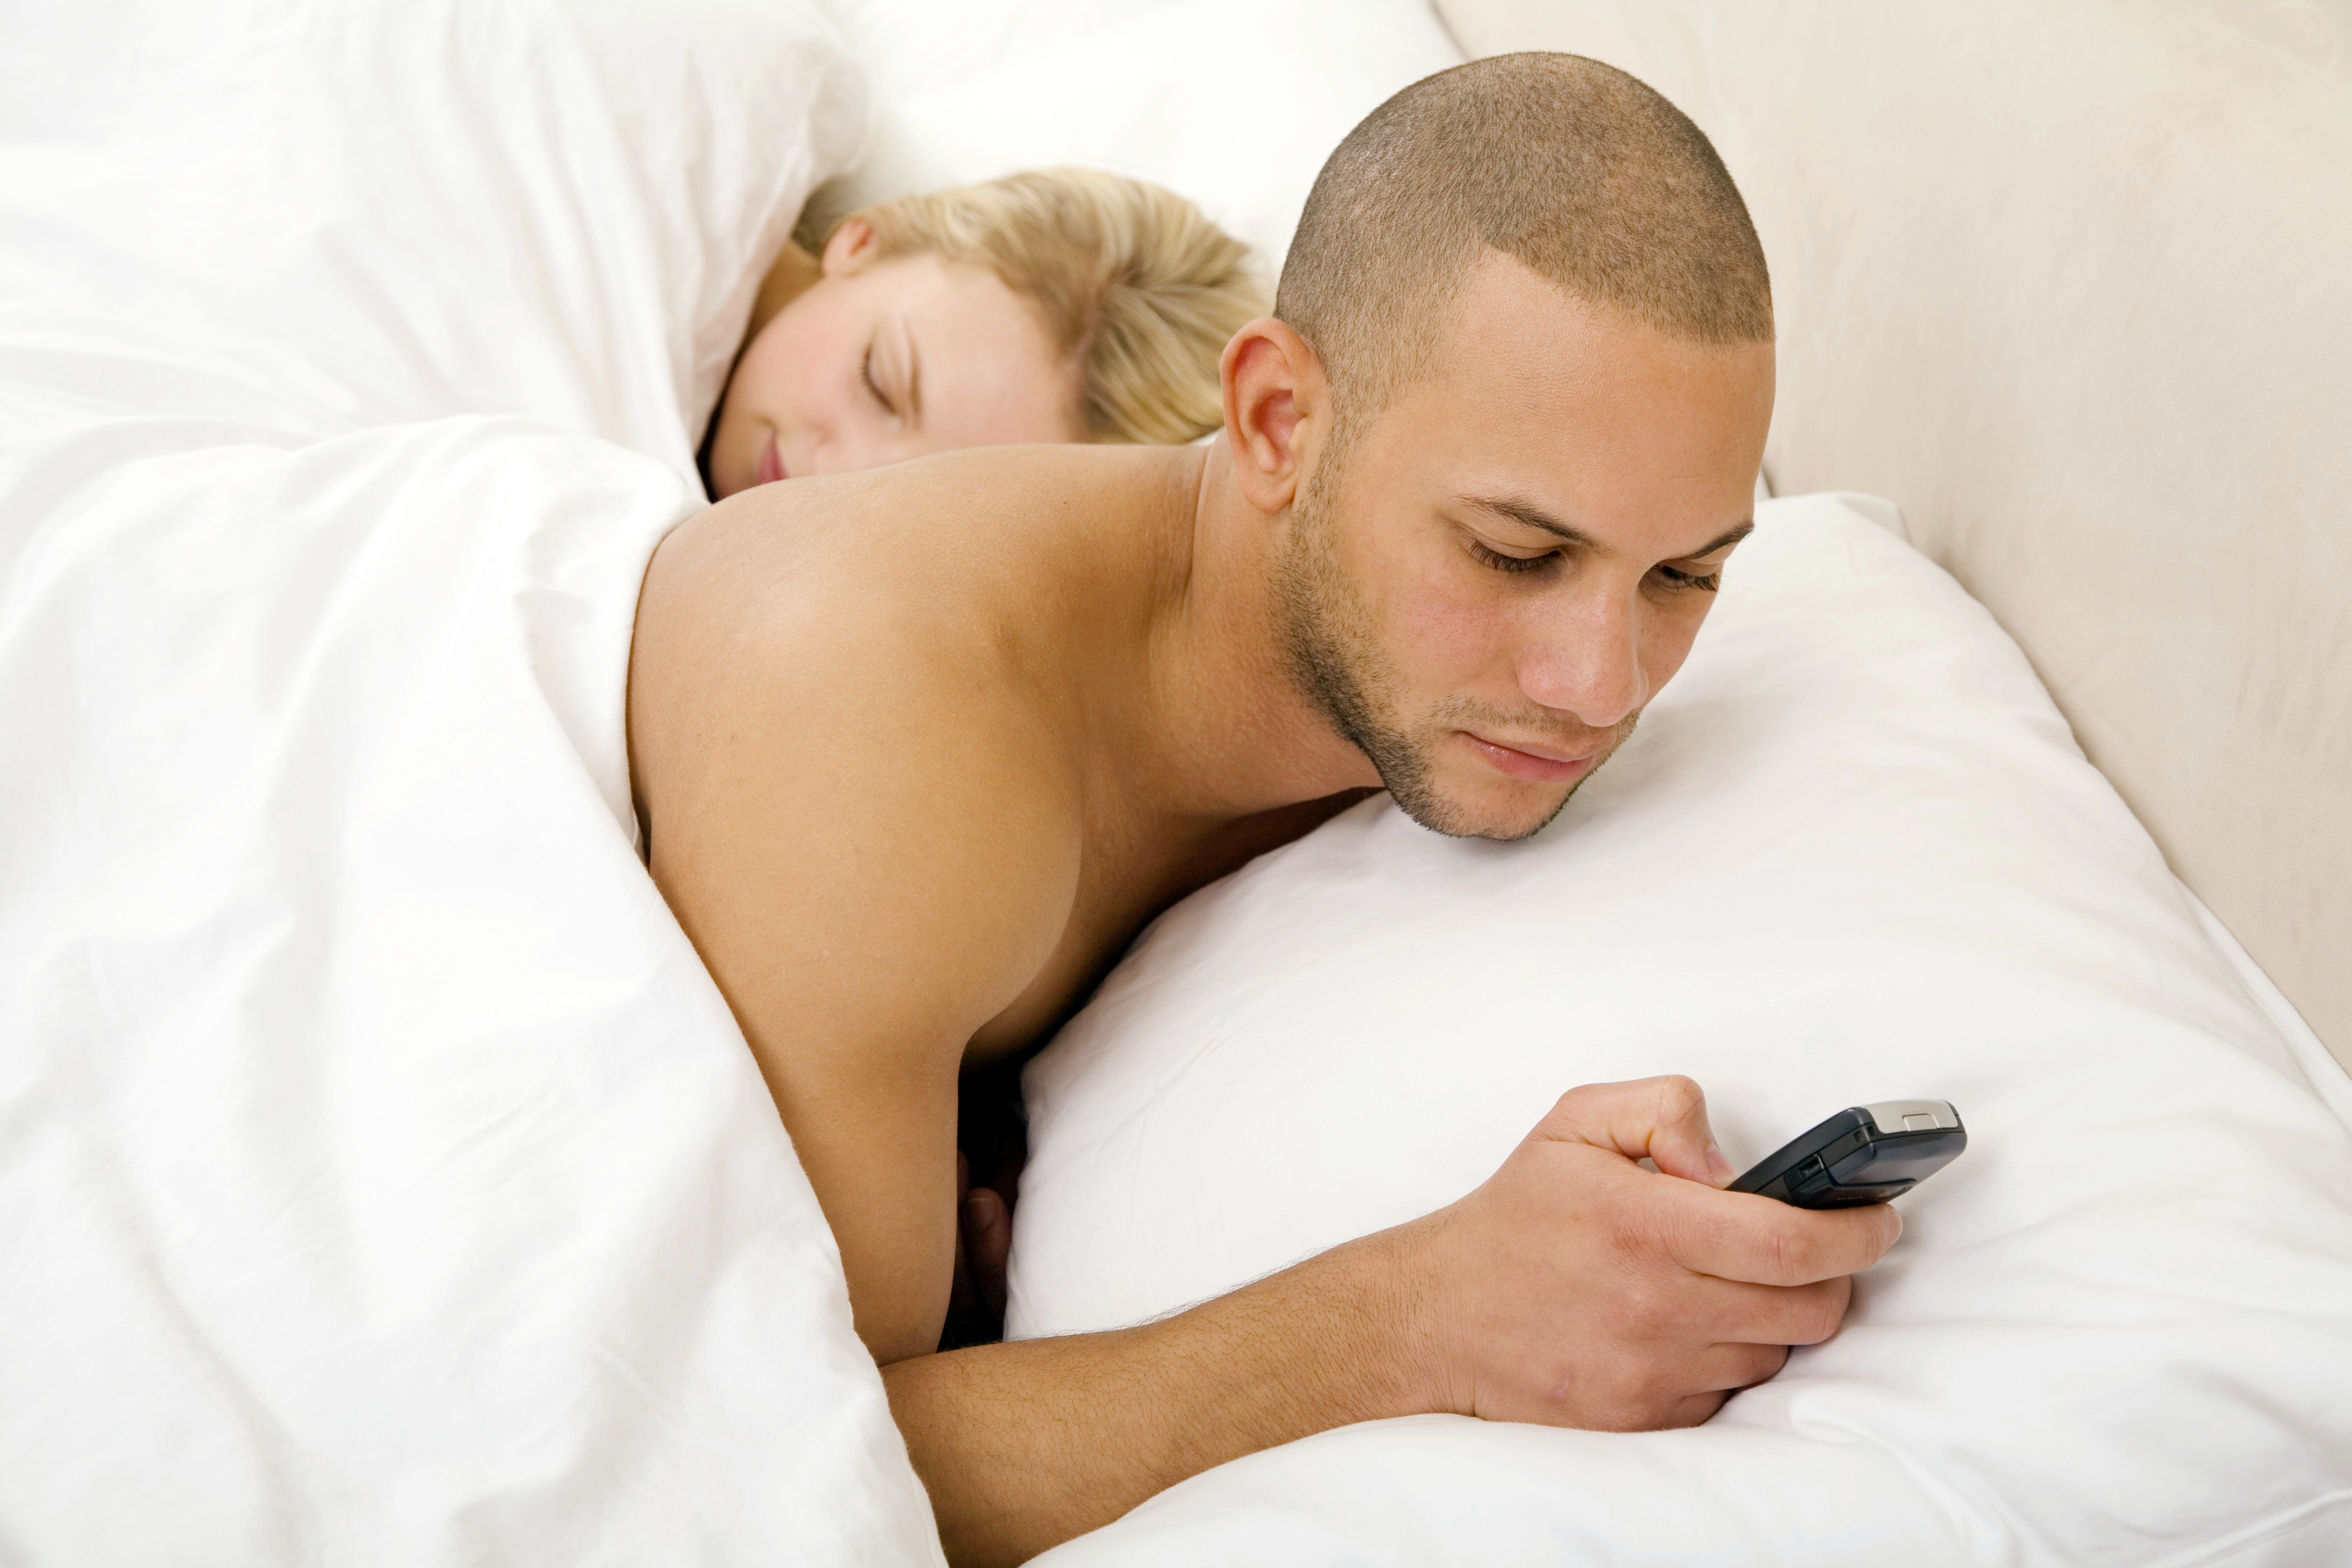 Free wife sex pics